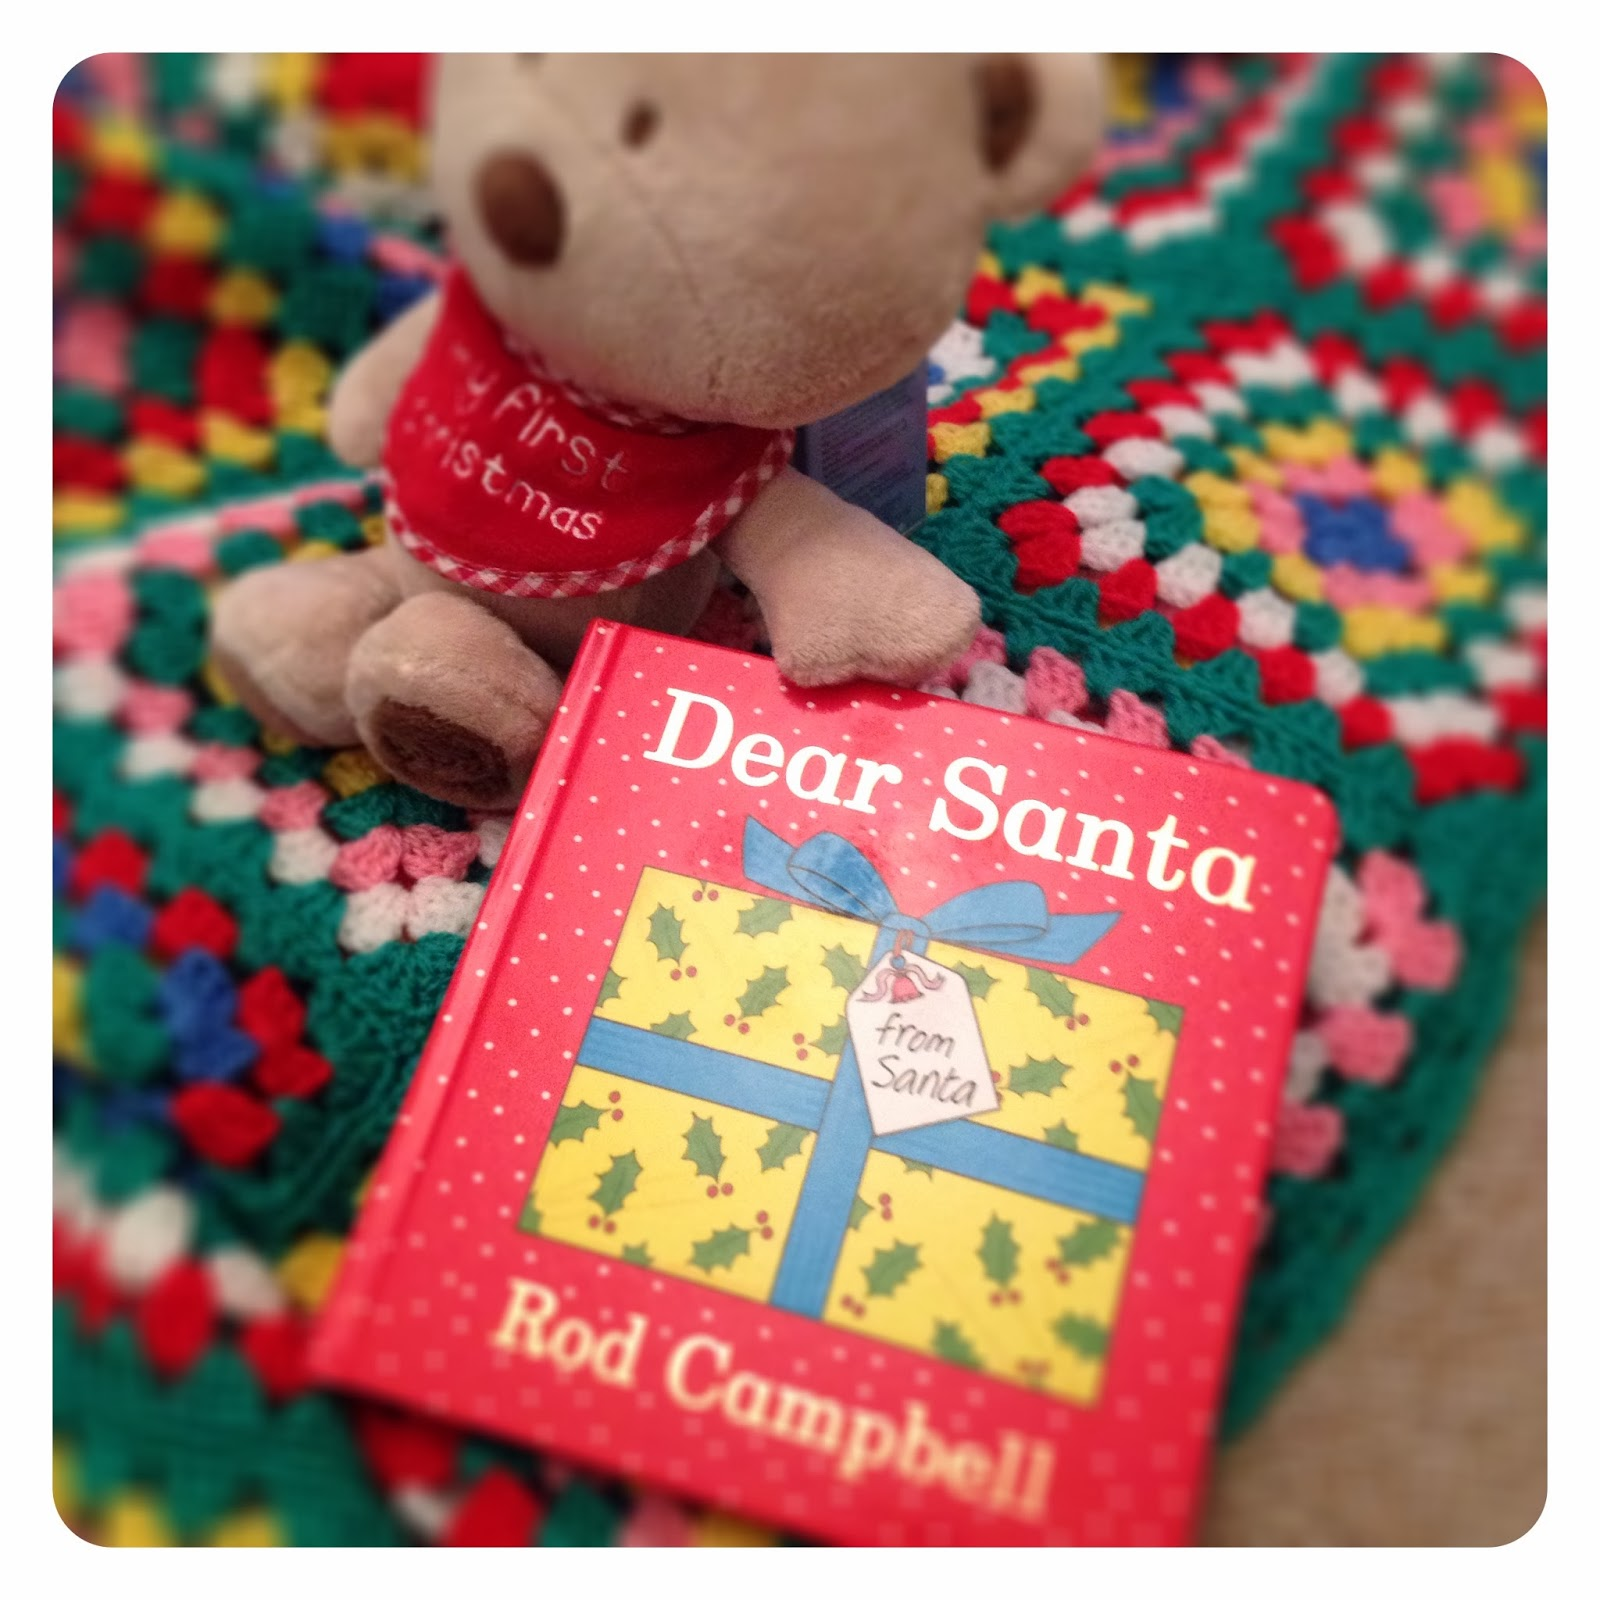 mamasVIB | V. I. BOOKCLUB: Build a classic *CHRISTMAS* library for kids (Dear Santa) , V. I. BOOKCLUB | Build a classic *CHRISTMAS library | Dear Santa| children's books | mamasVIB